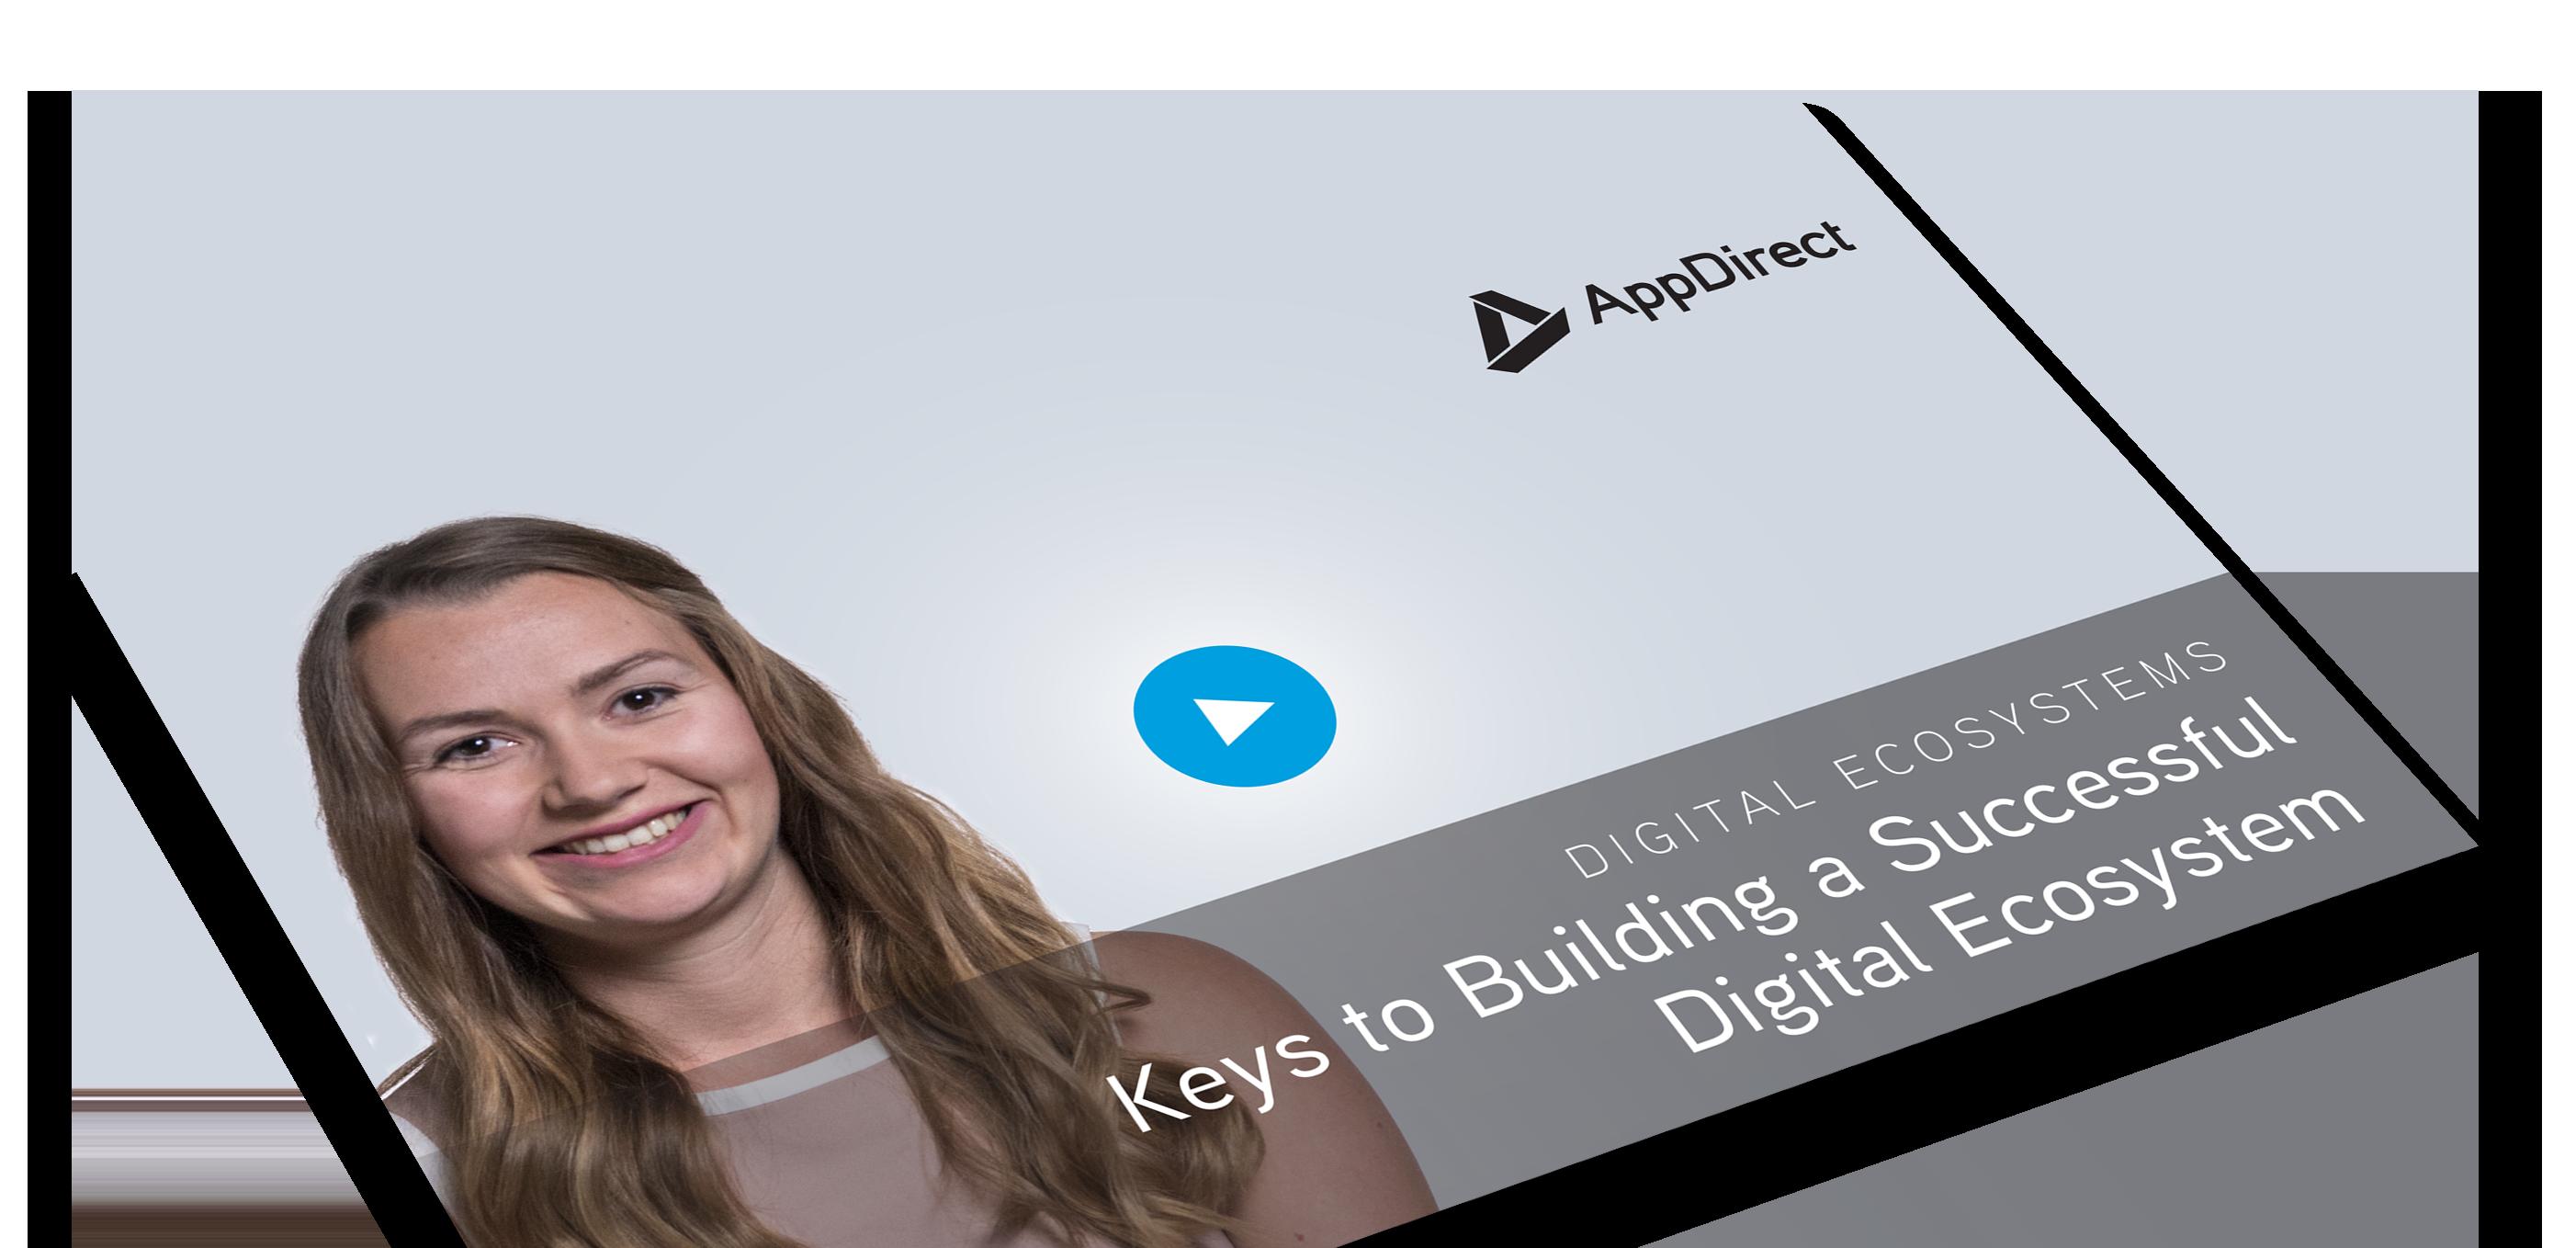 Keys to Building Successful Digital Ecosystems